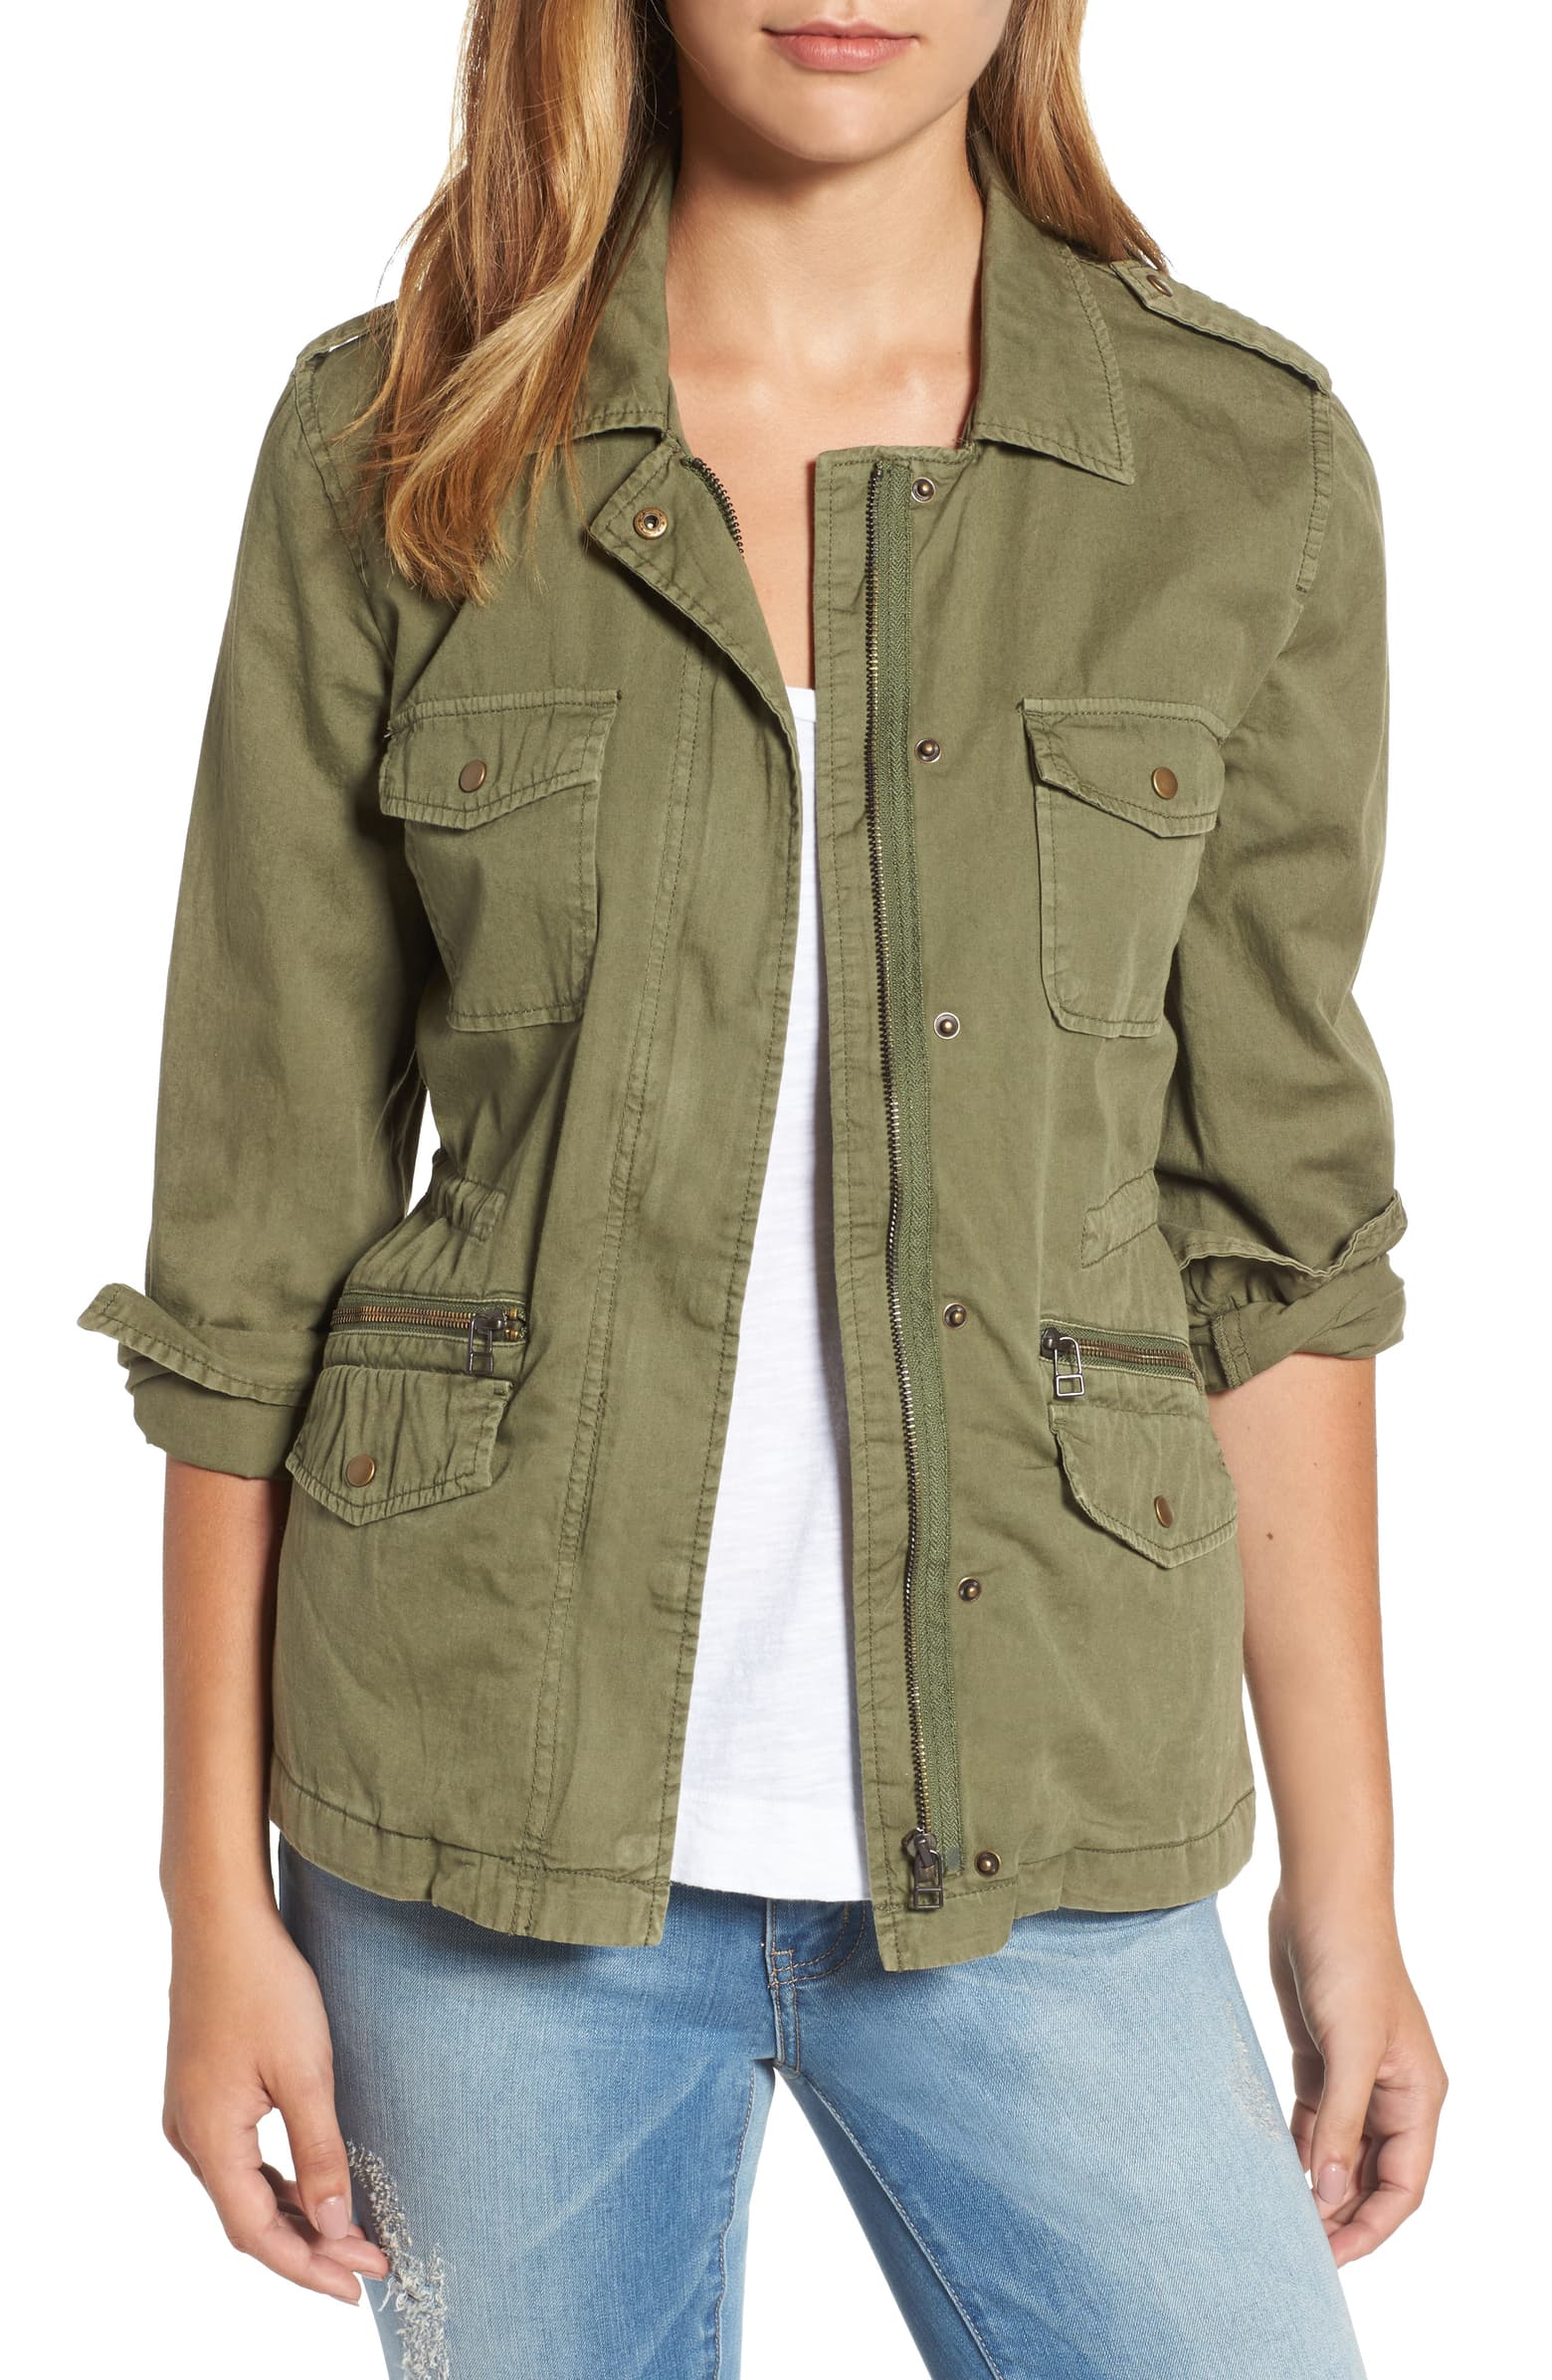 Army Jacket, $150, Nordstrom